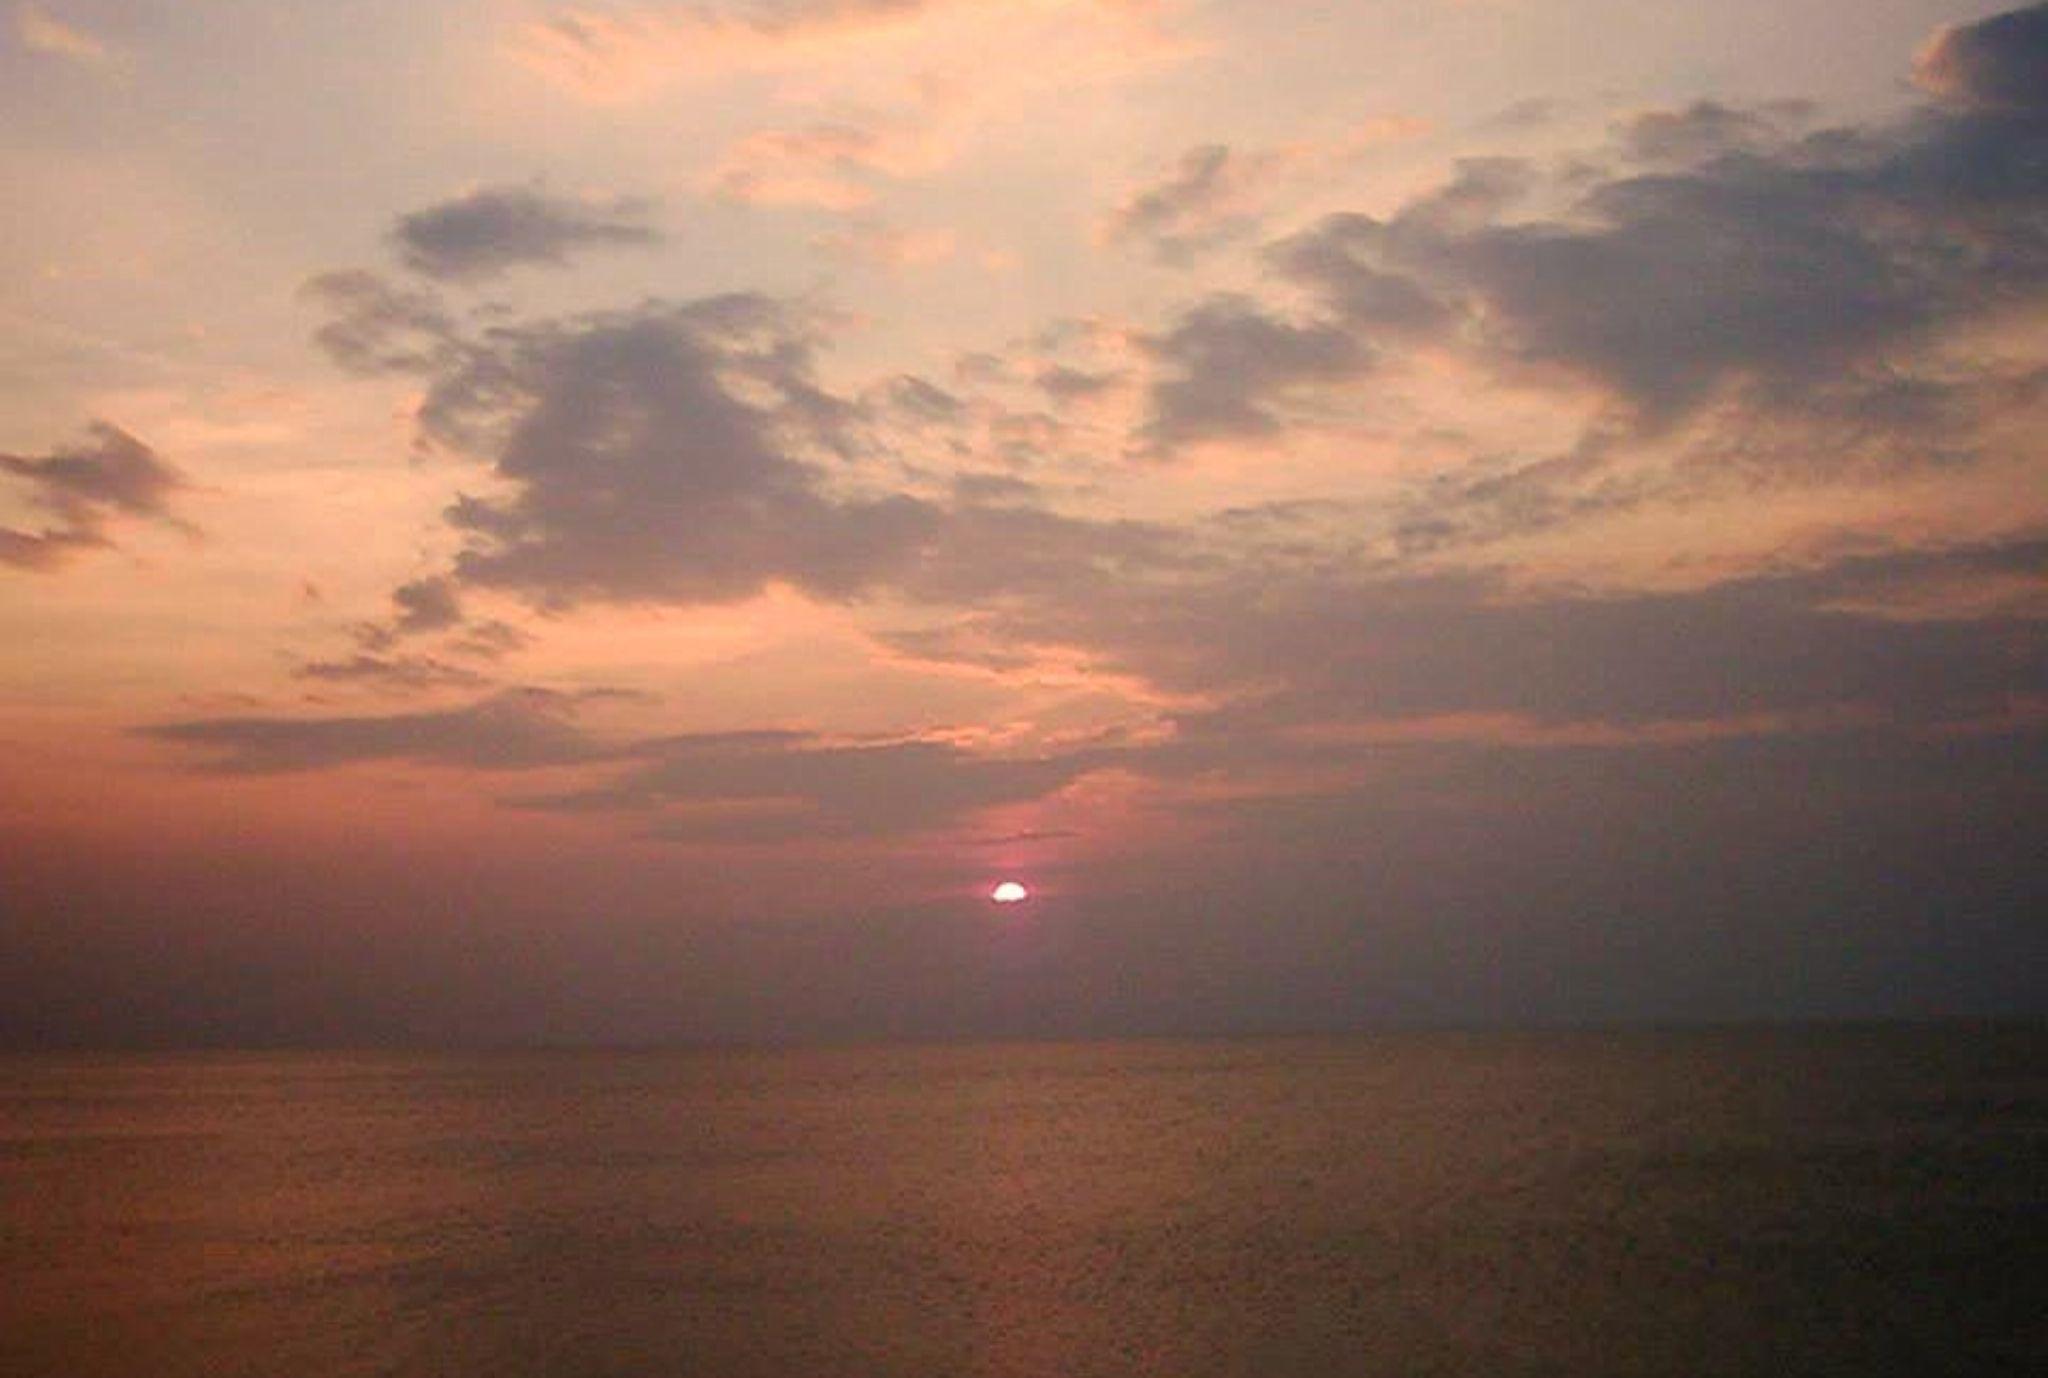 sunset by chris.adams.3557